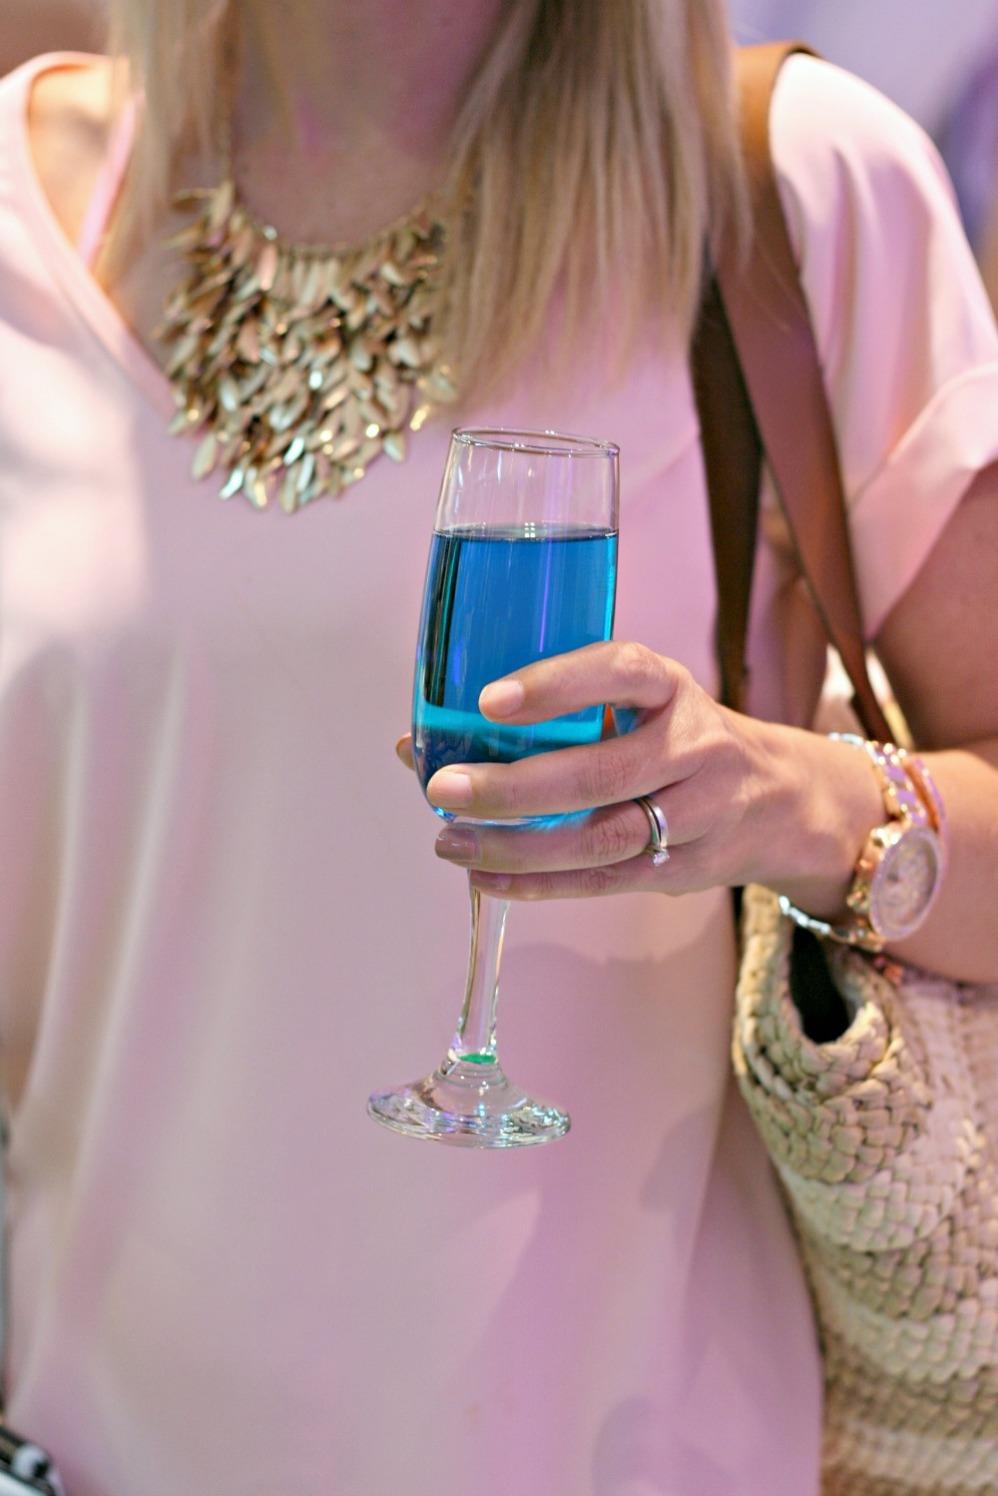 cf rideau carolyn champagne close up